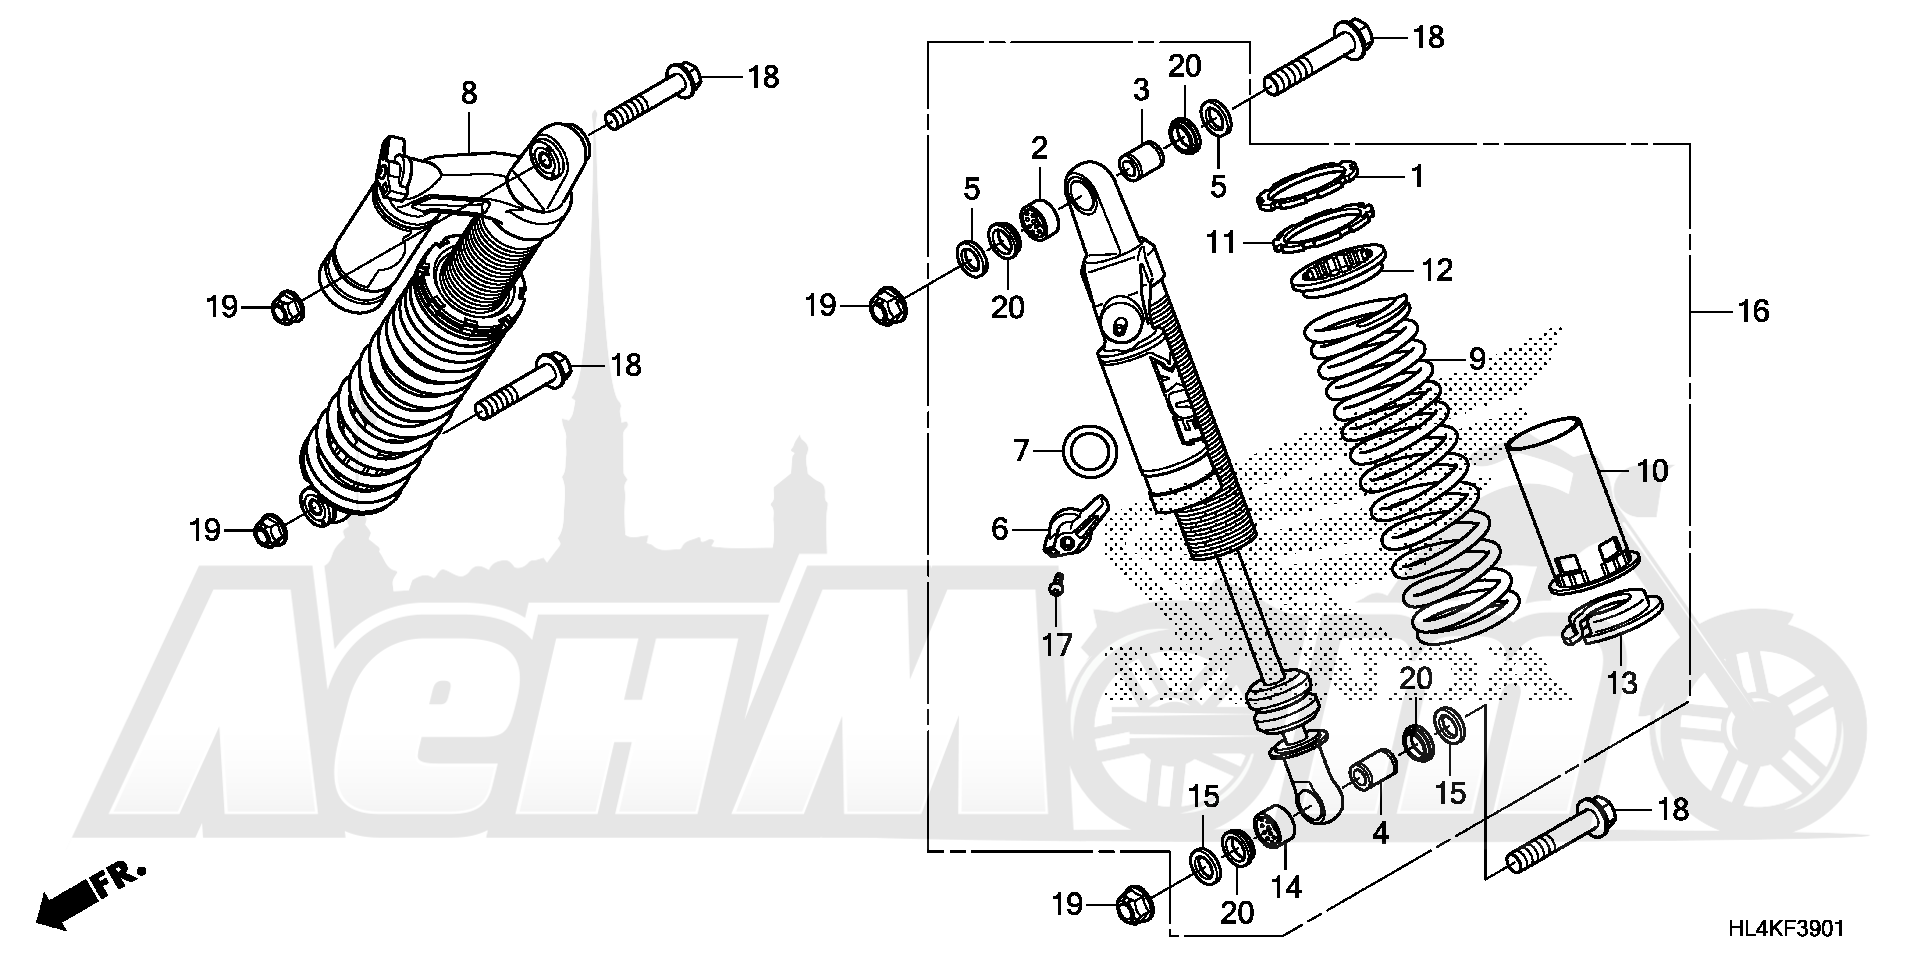 Запчасти для Квадроцикла Honda 2019 SXS1000M5L Раздел: REAR SHOCK ABSORBER (2) | зад амортизатор (2)